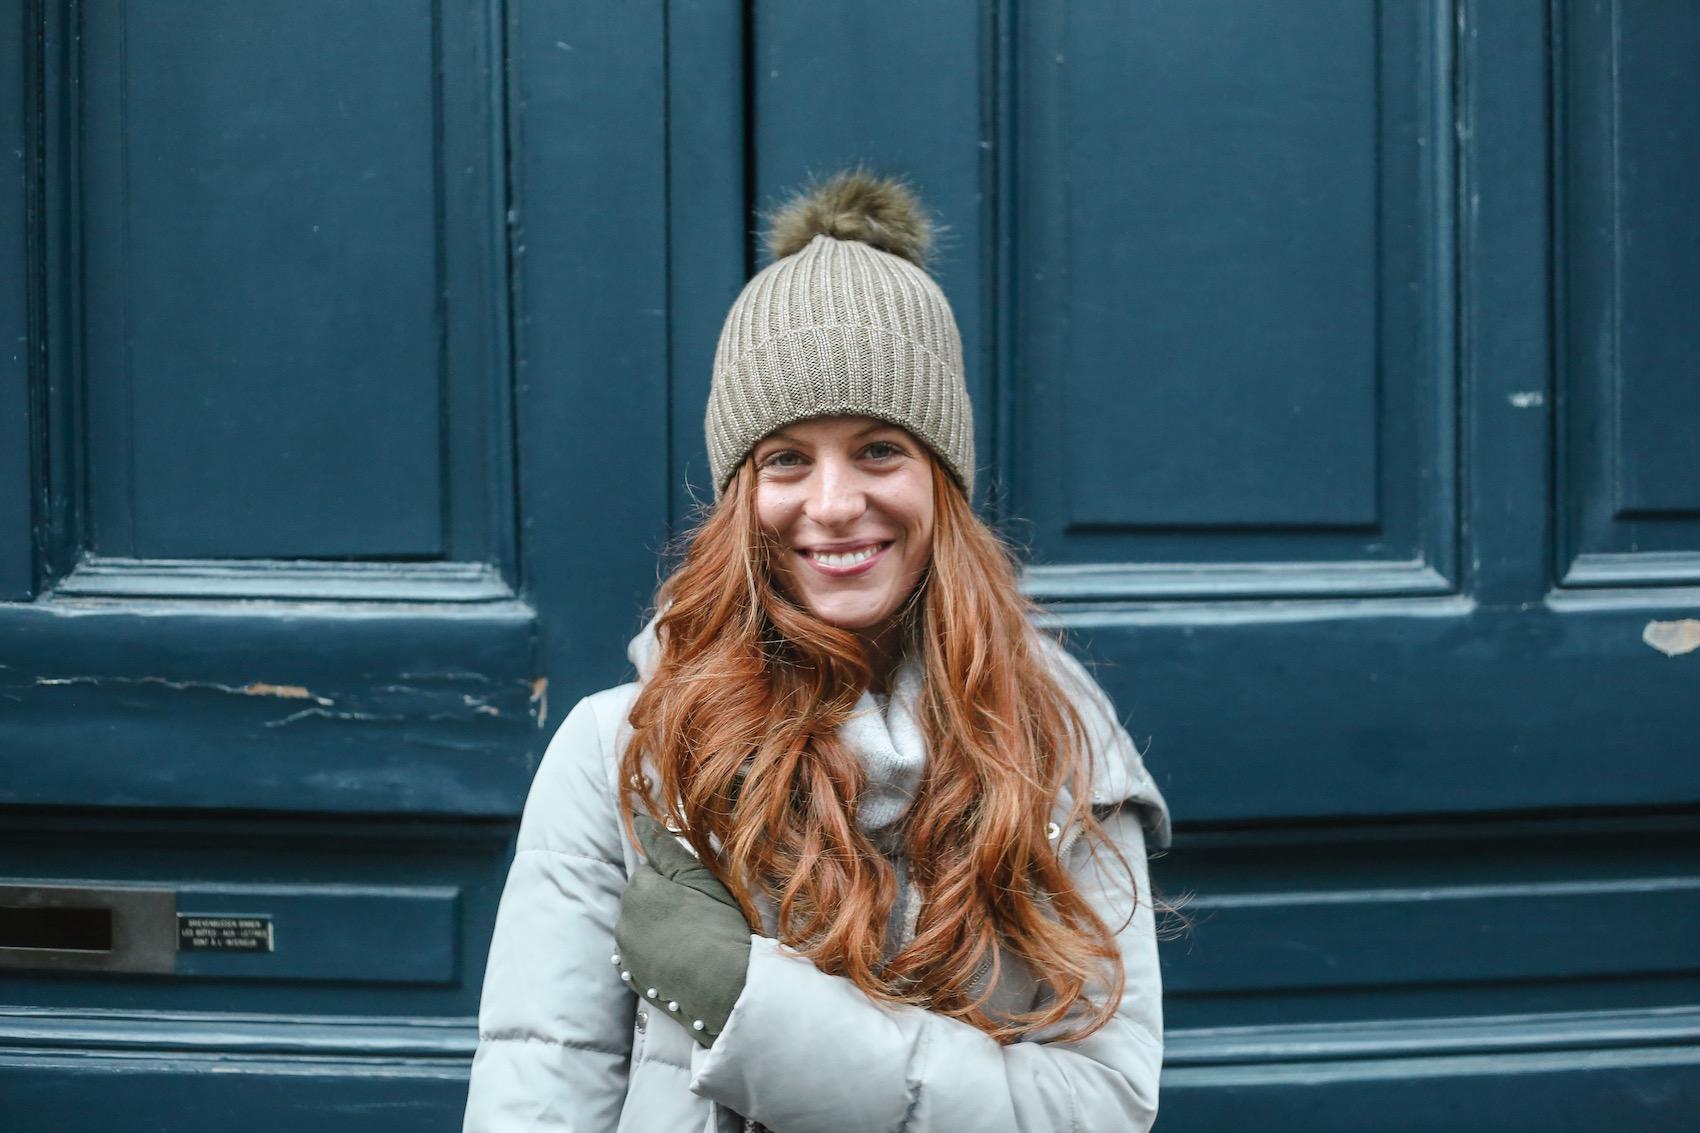 travel-blog-redhead-round-the-world-blogger-blue-belgium-brussels.JPG